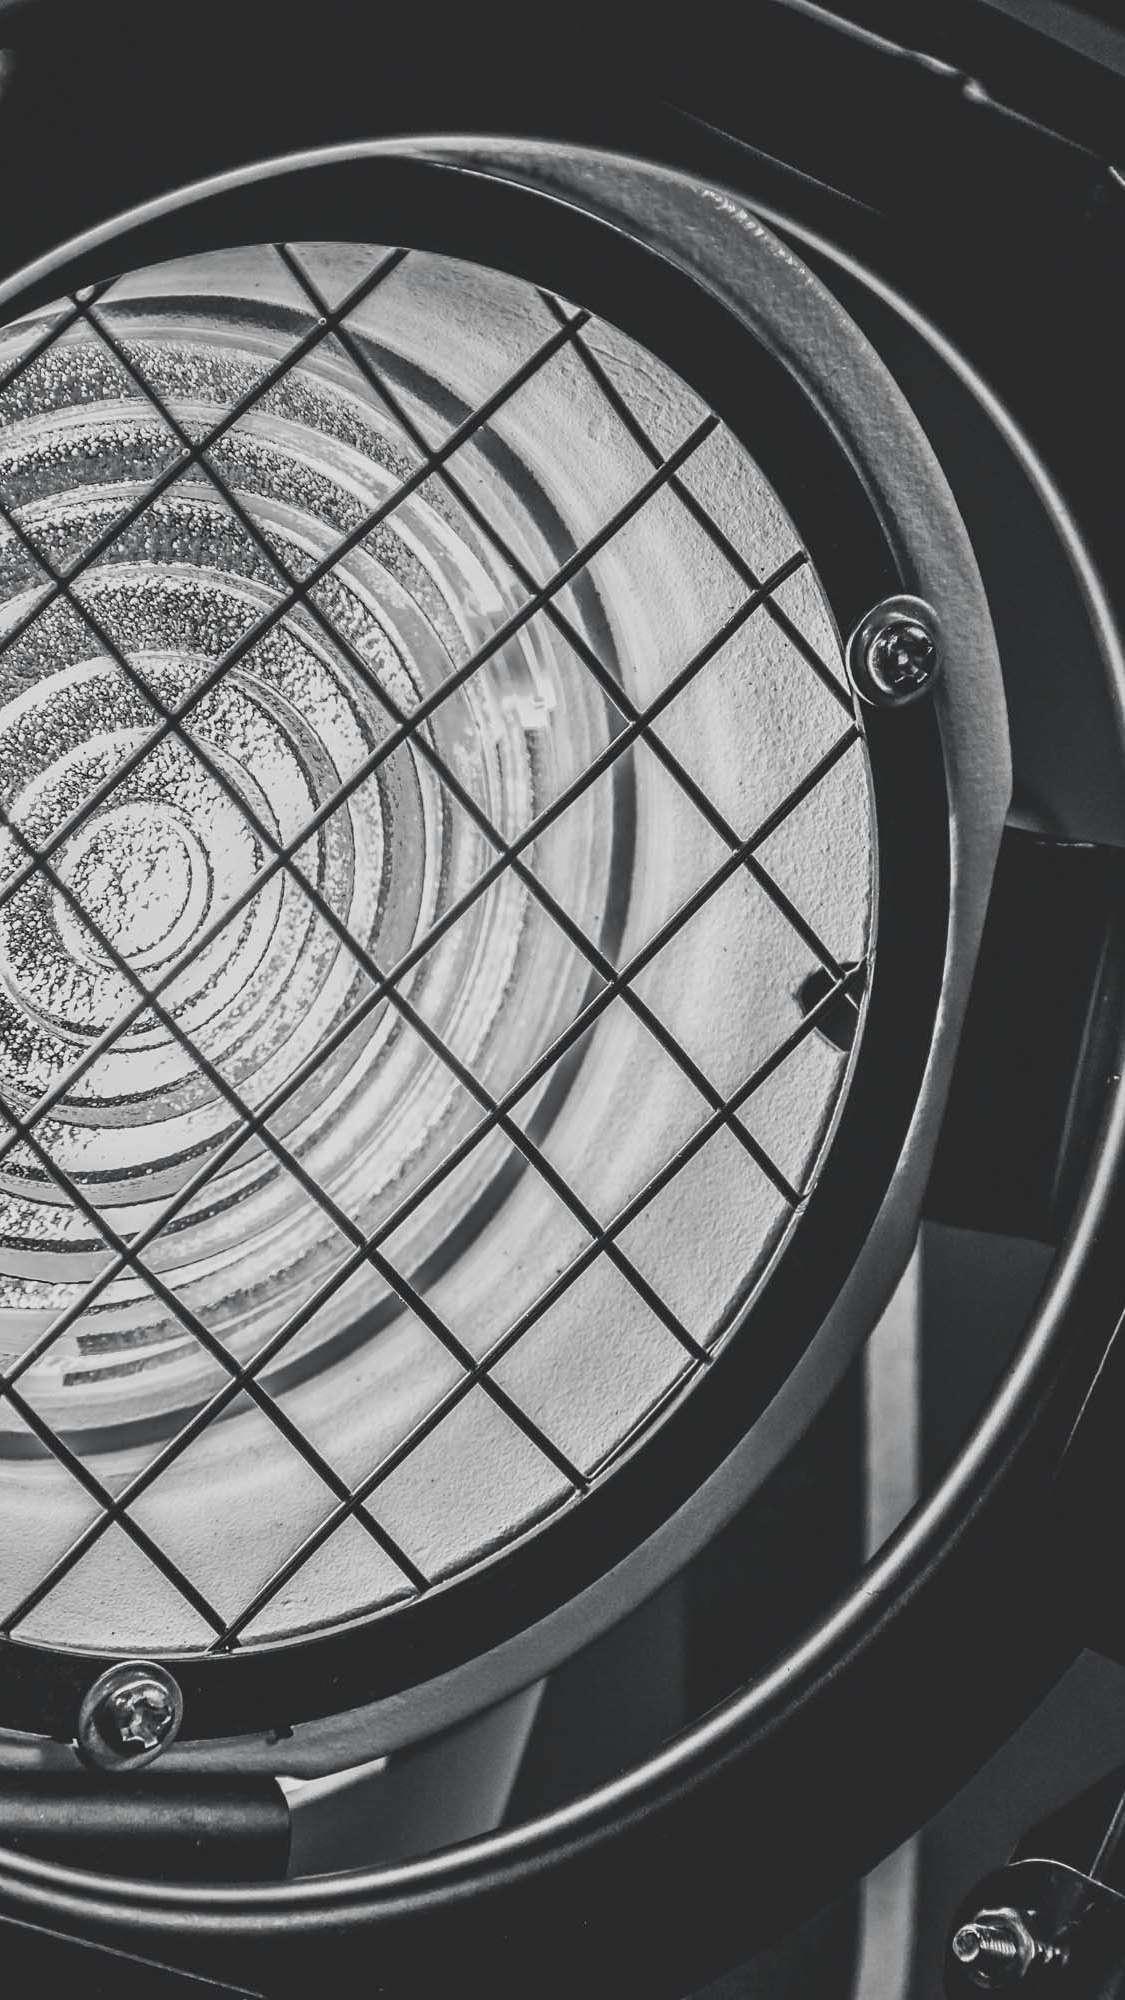 Klangfein - Lichttechnik | Theater | Scheinwerfer | Spot | Theater | Veranstaltungstechnik | LED | Beleuchtung | Messe | Event | Firma | Business | Buchen | Mieten | Anfragen | Hannover